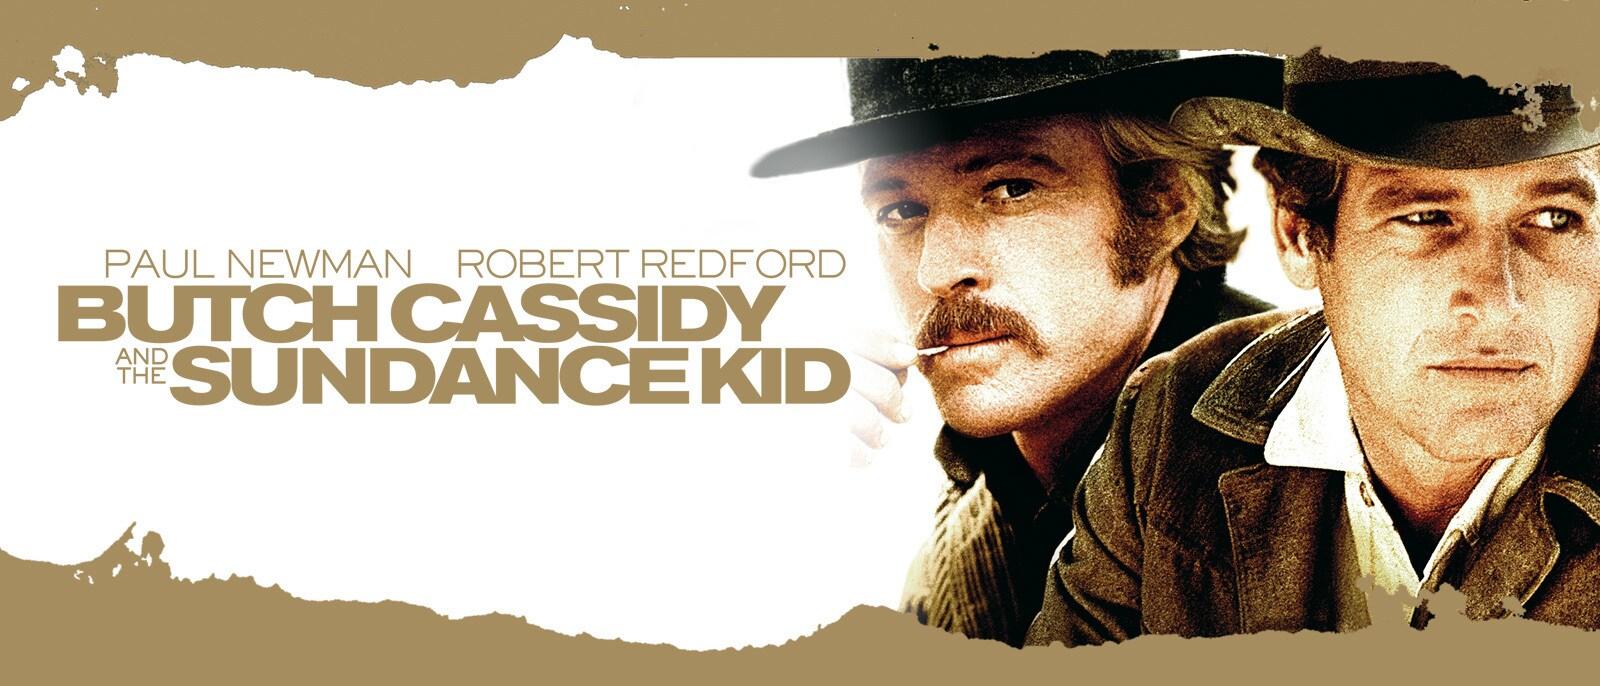 Butch Cassidy and the Sundance Kid Hero